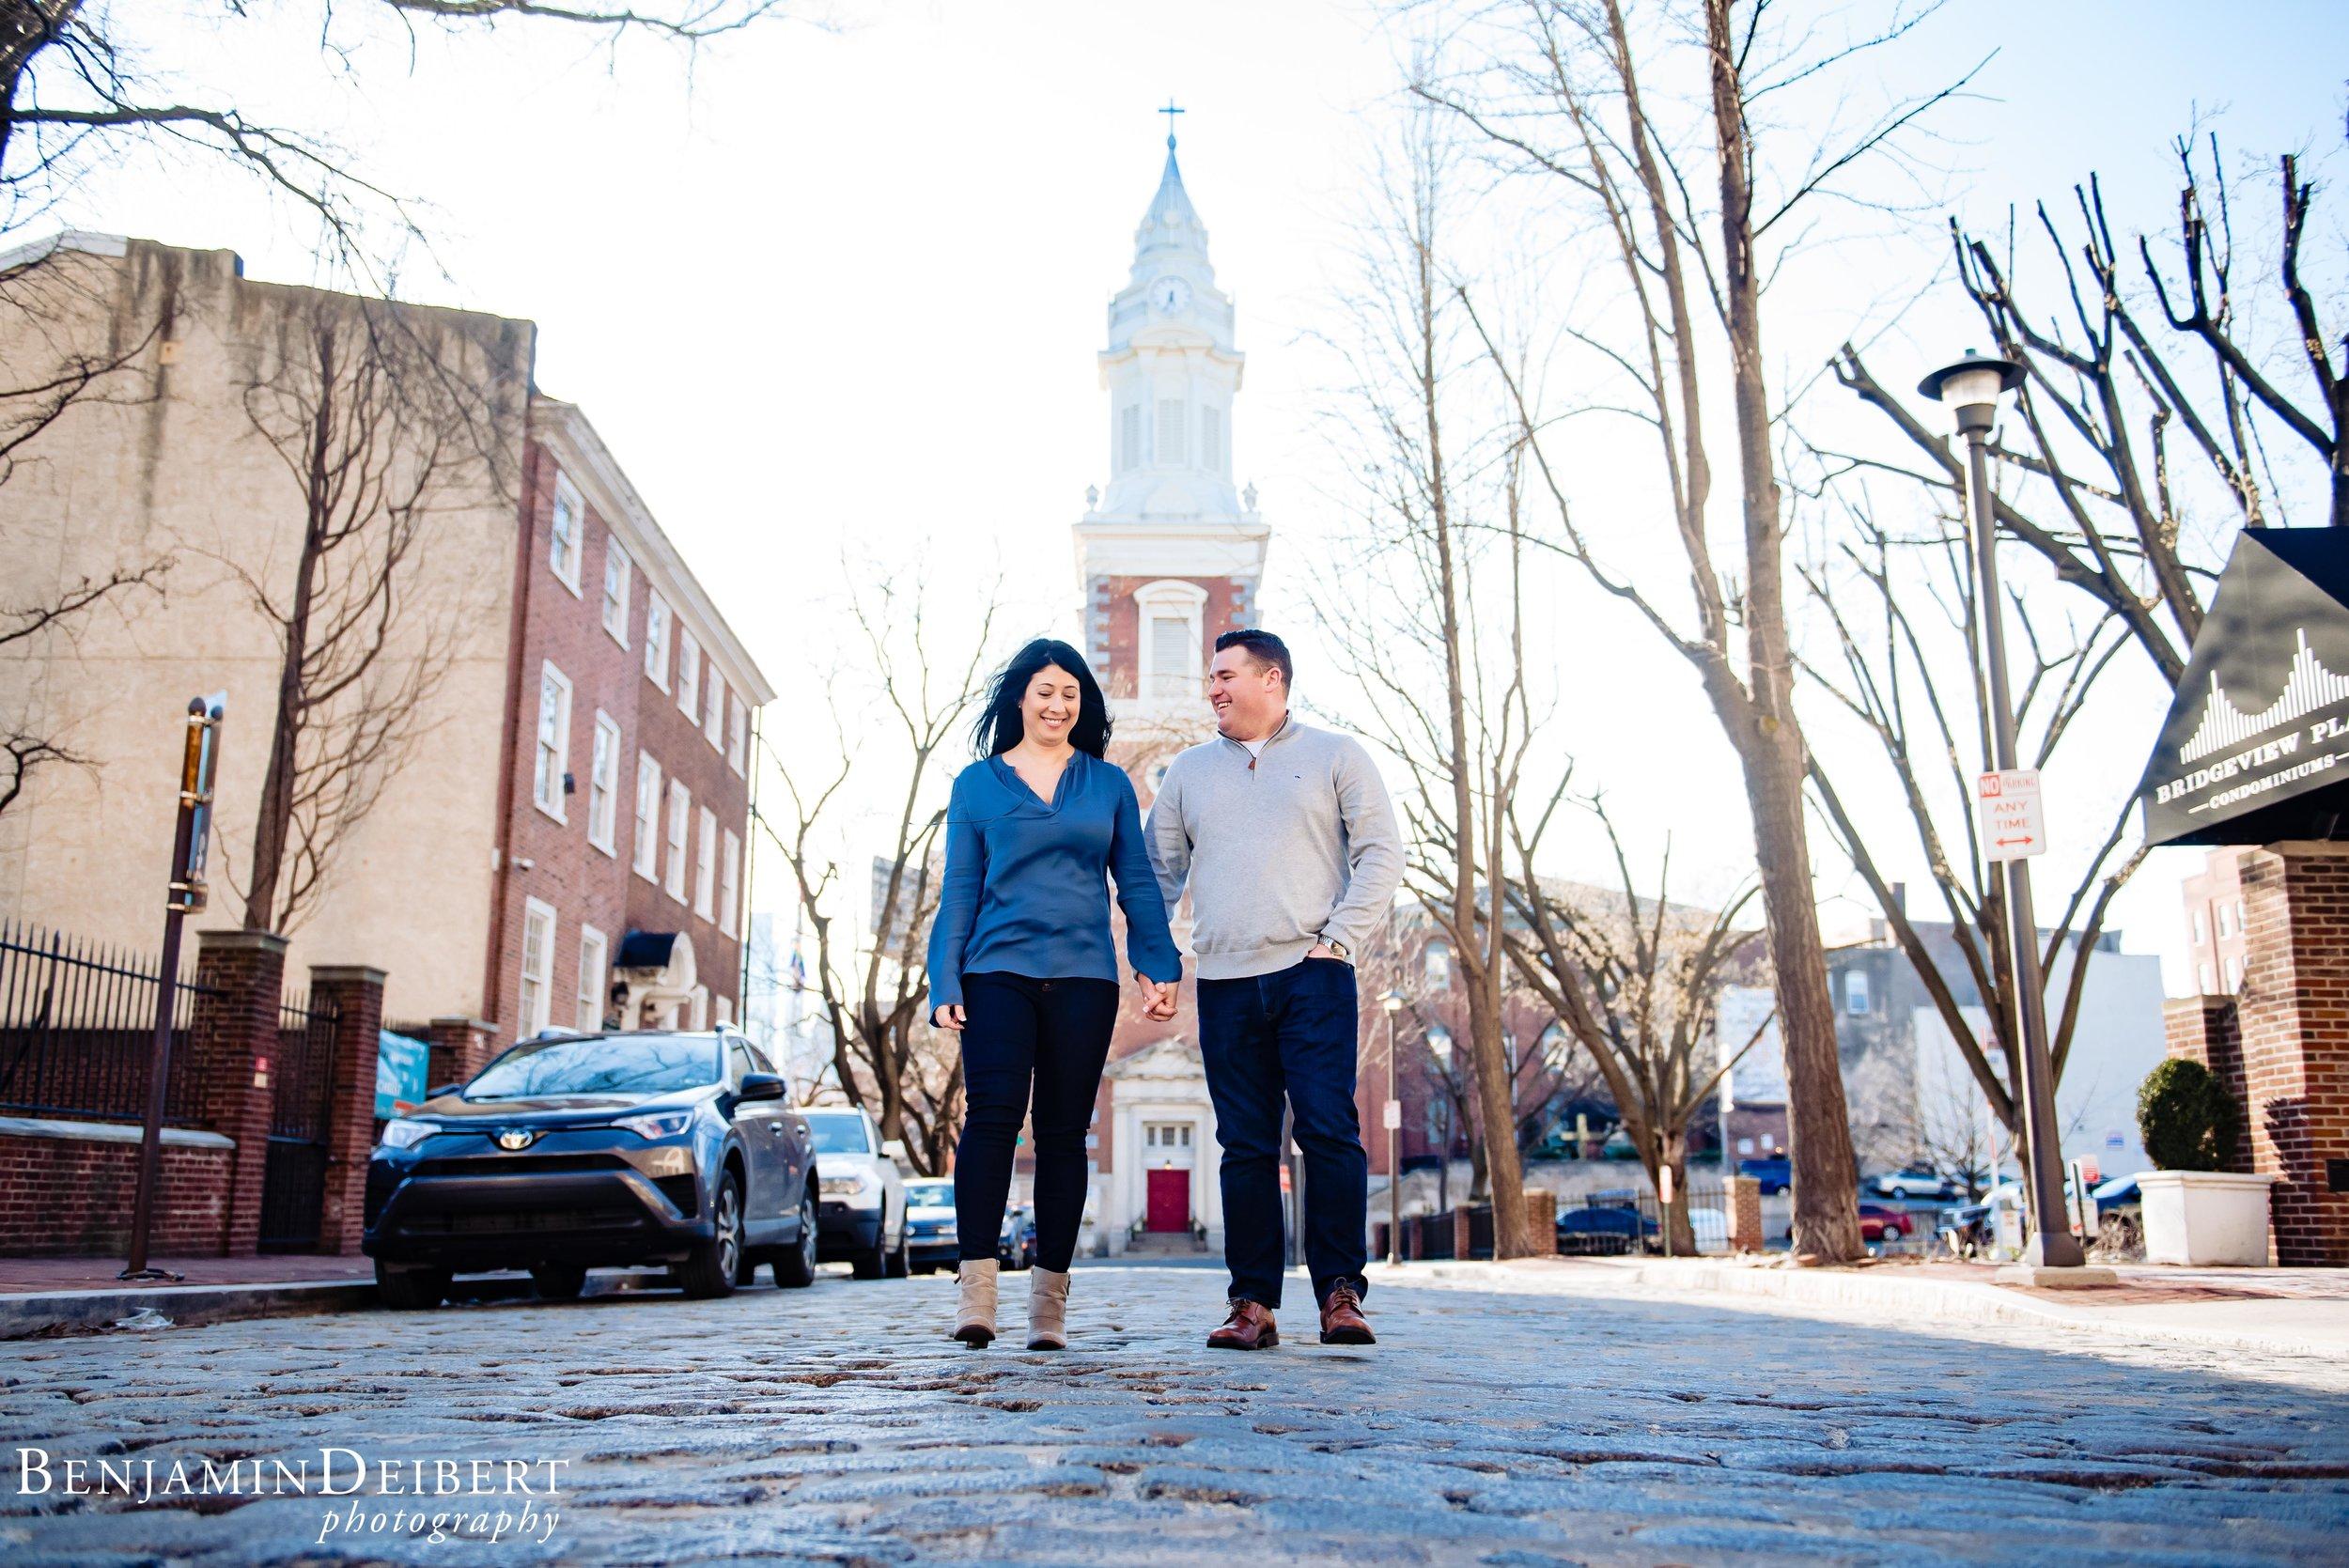 Old_City_Philadelphia_Engagement_Photos_1.jpg